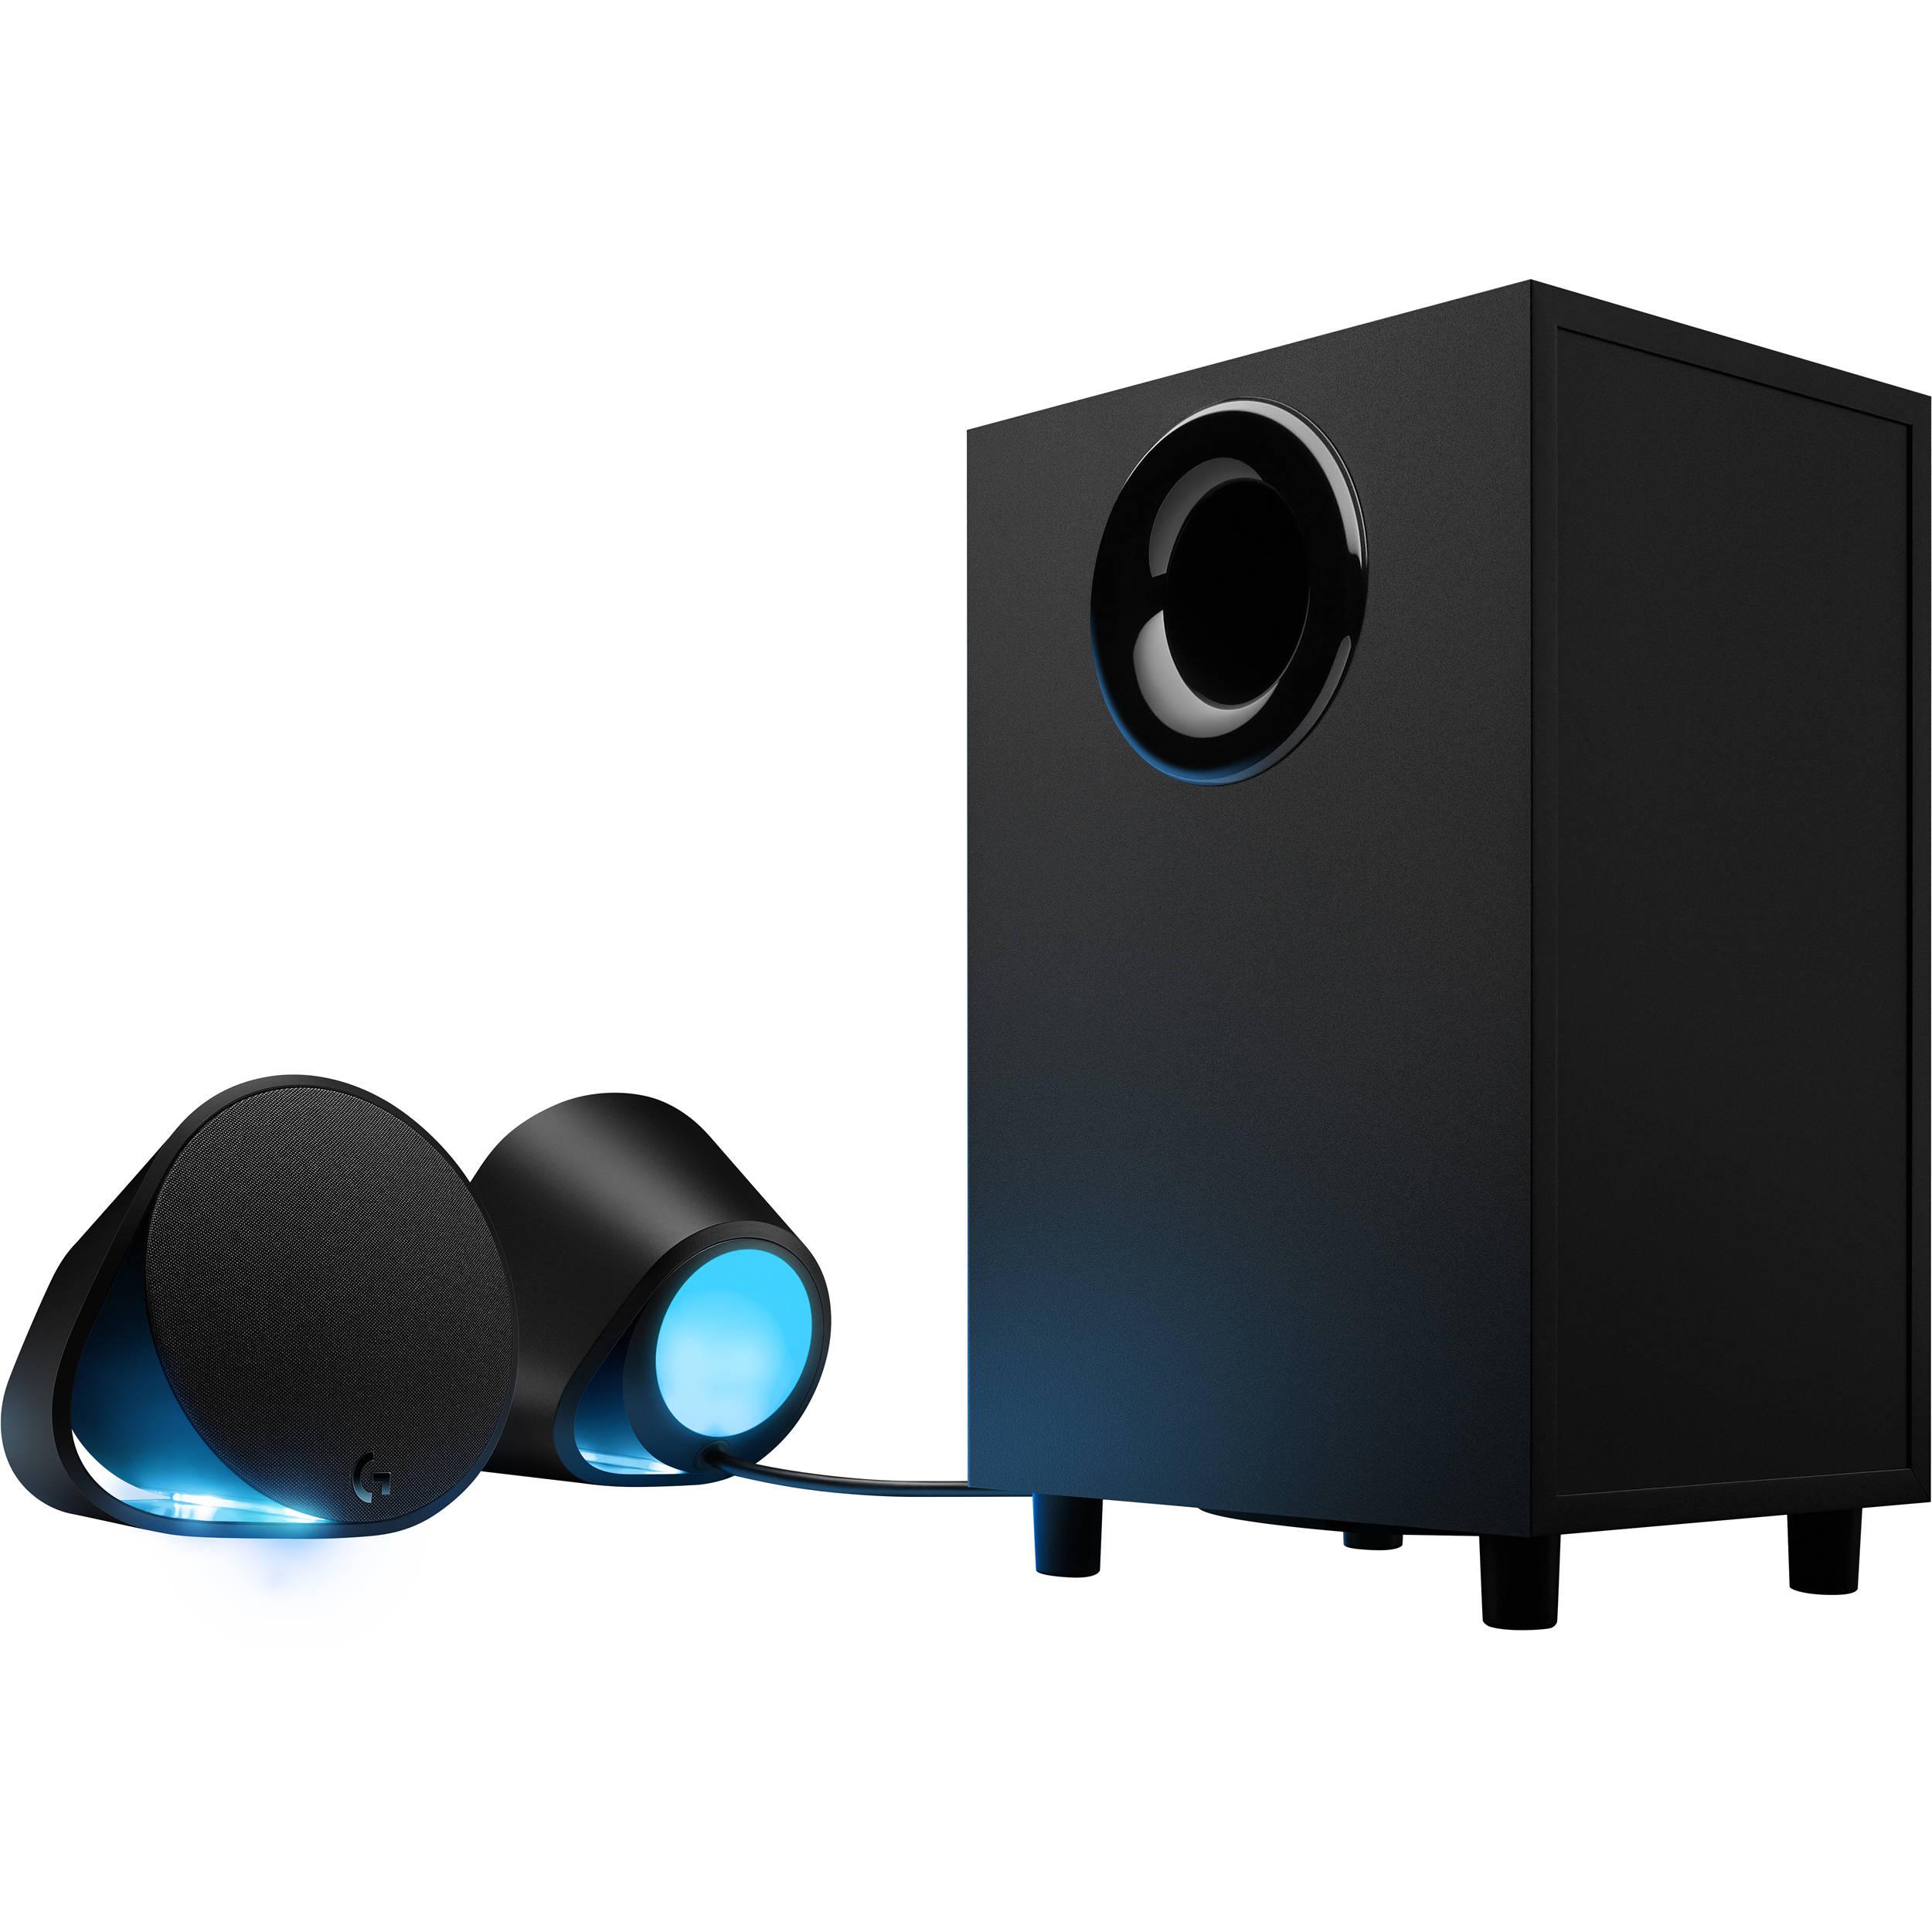 d404f4bab19 Logitech G560 LIGHTSYNC PC Gaming Speakers 980-001300 B&H Photo